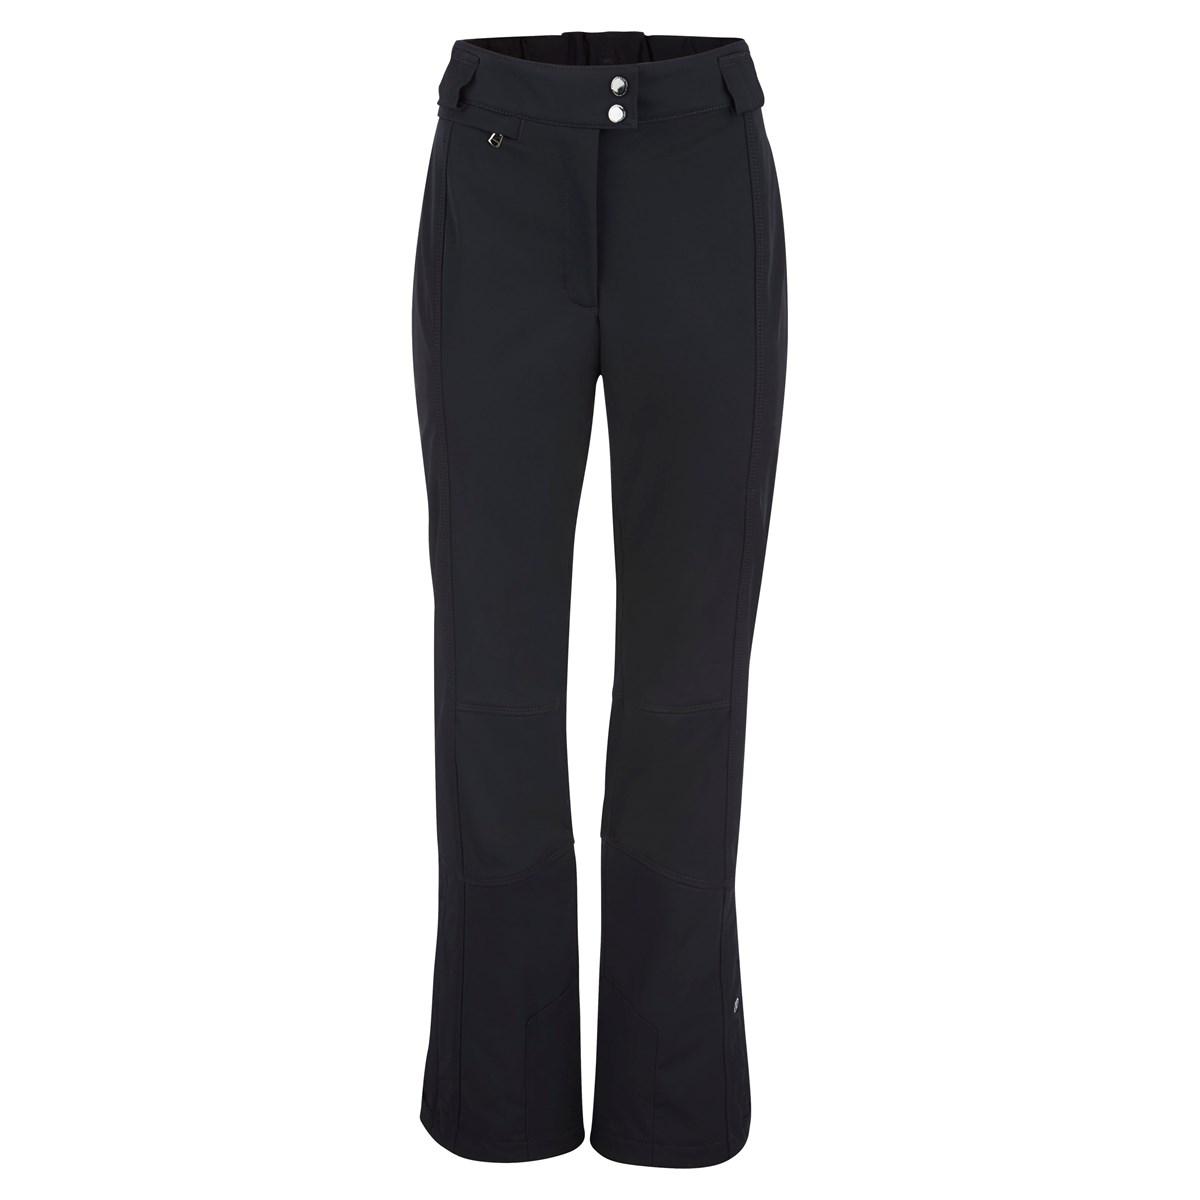 Poivre Blanc Womens Fitted Stretch Ski Pants Short Leg in Black £179.00 7492d98aaf